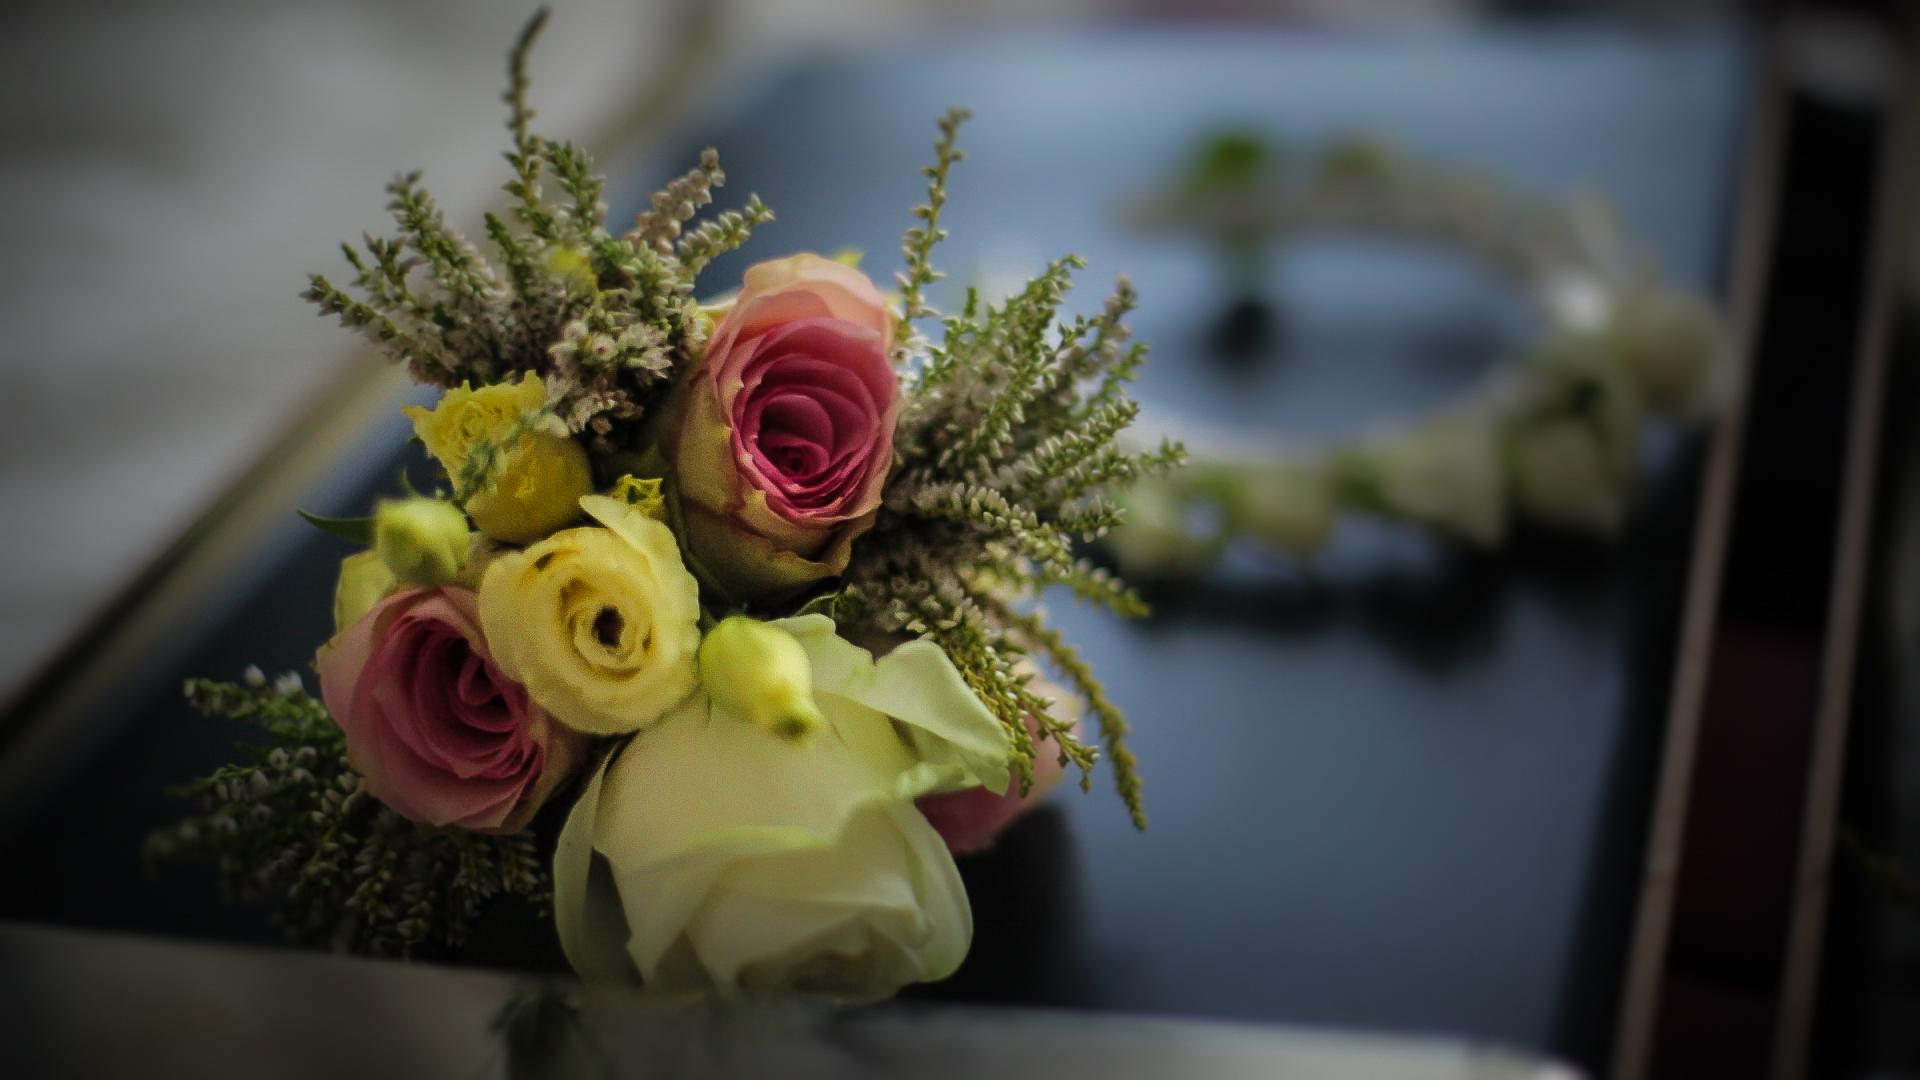 flowers-bouquet-richmond-london-uk-destination-wedding-photography-Adam-Rowley